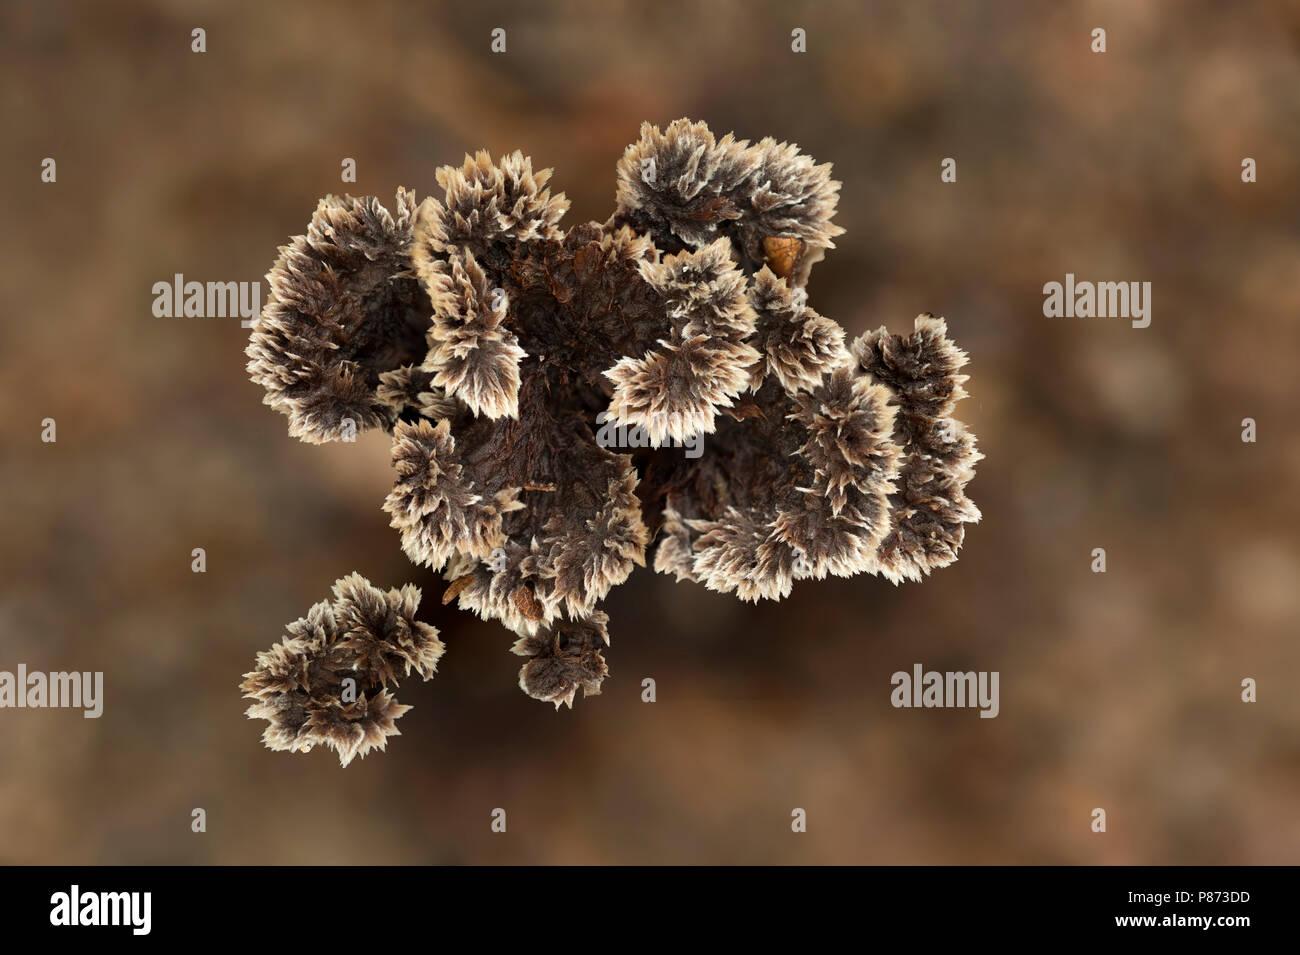 gewone franjezwam; Thelephora terrestris - Stock Image